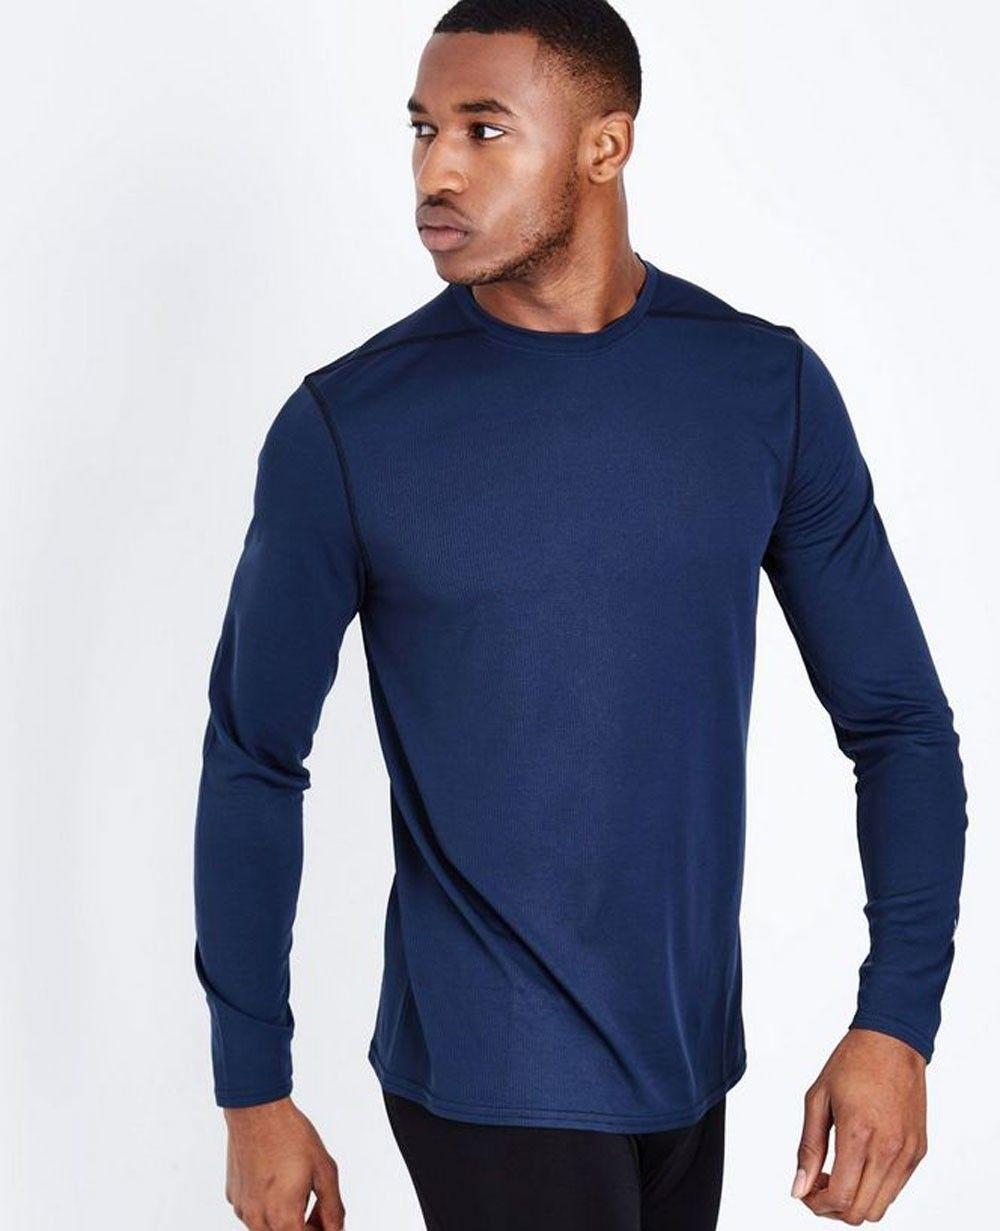 Navy Long Sleeve Crew Neck Sports Top Long sleeve tshirt